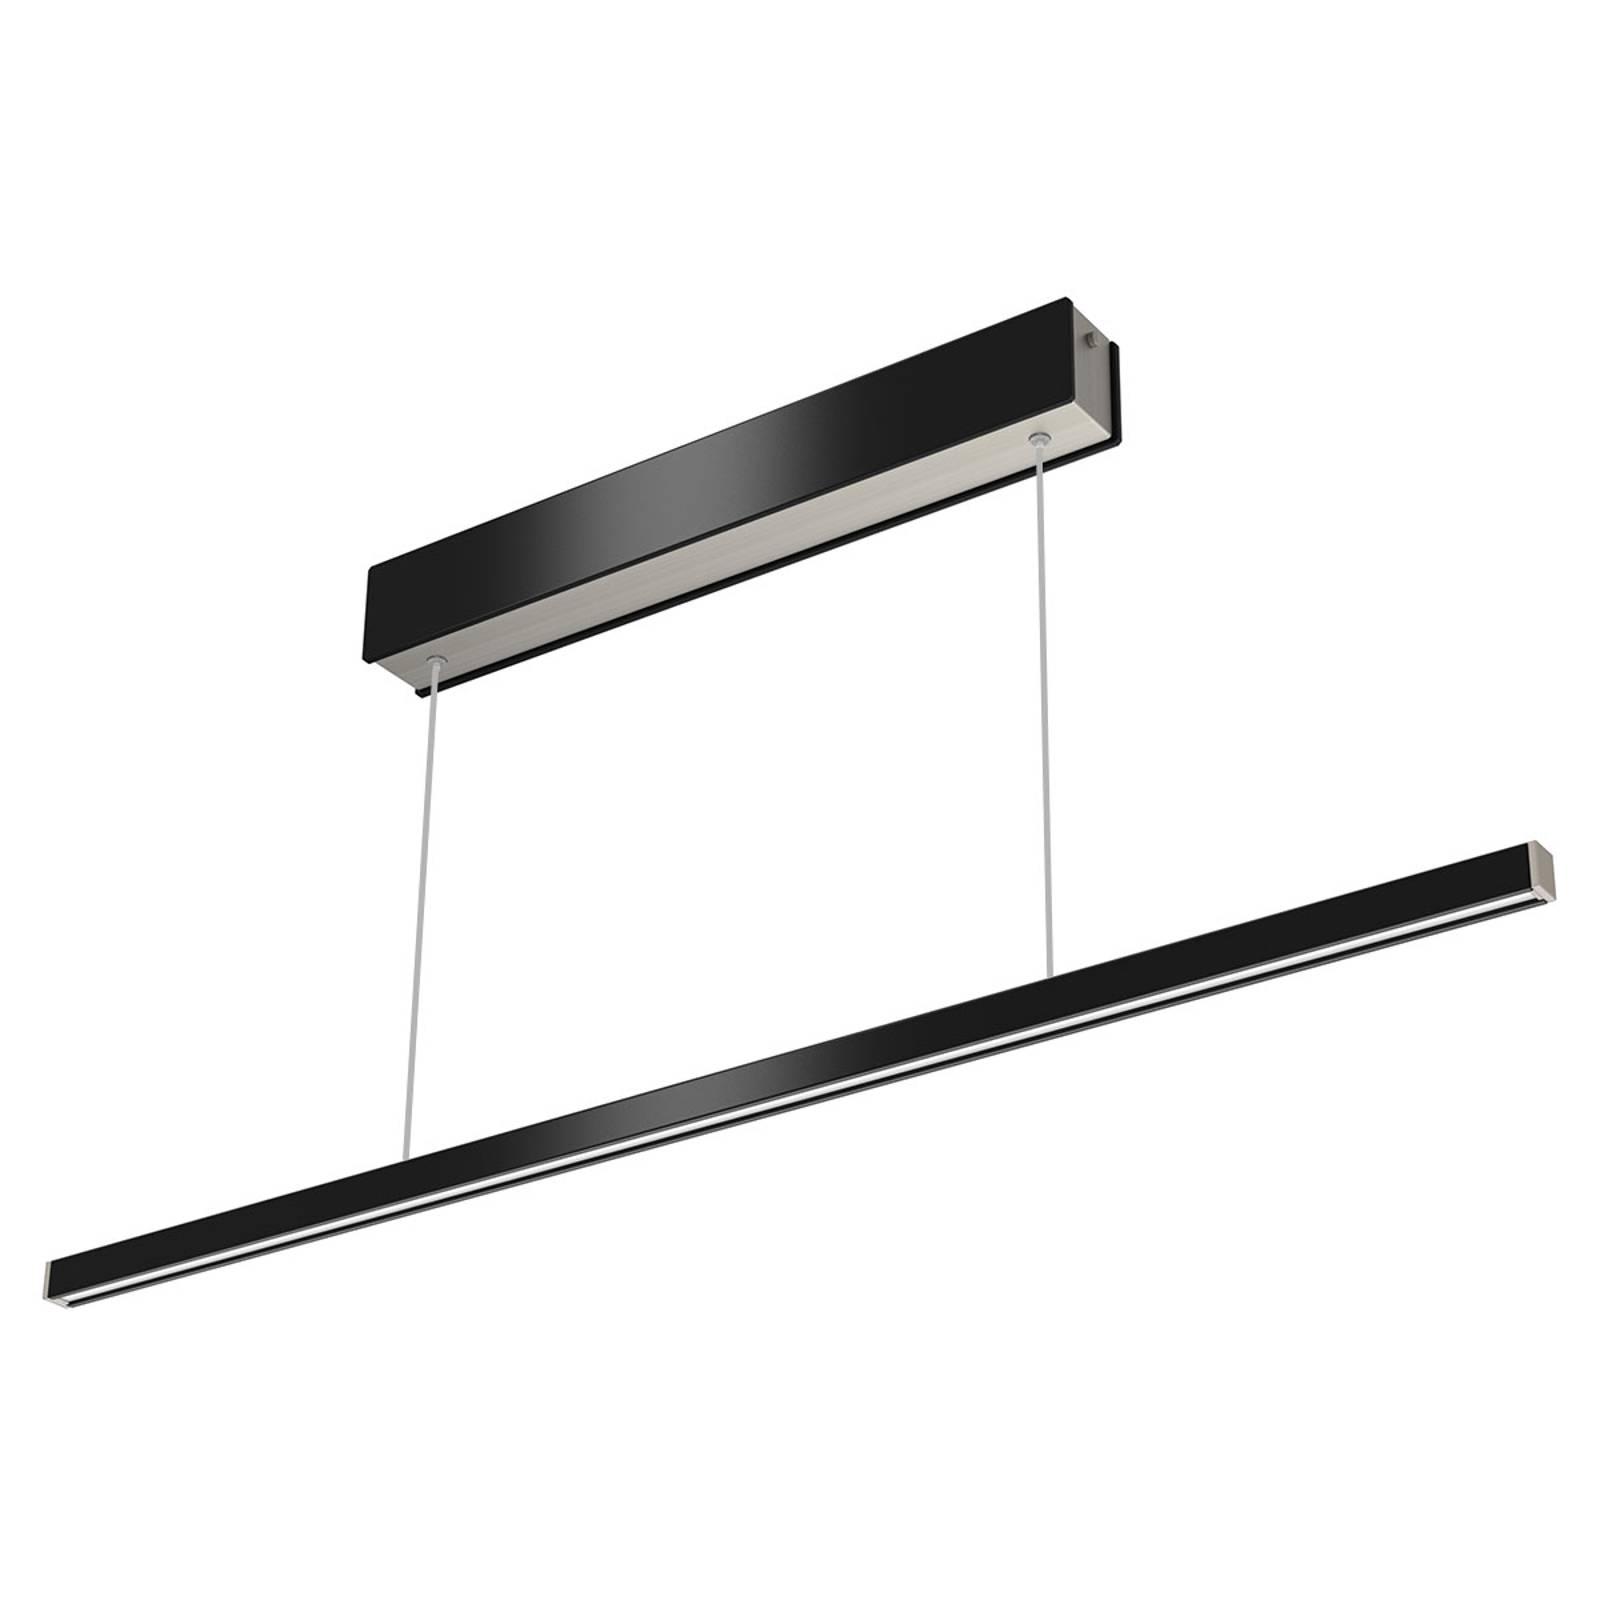 Fernbedienbare LED-Pendelleuchte Orix schw. 90 cm